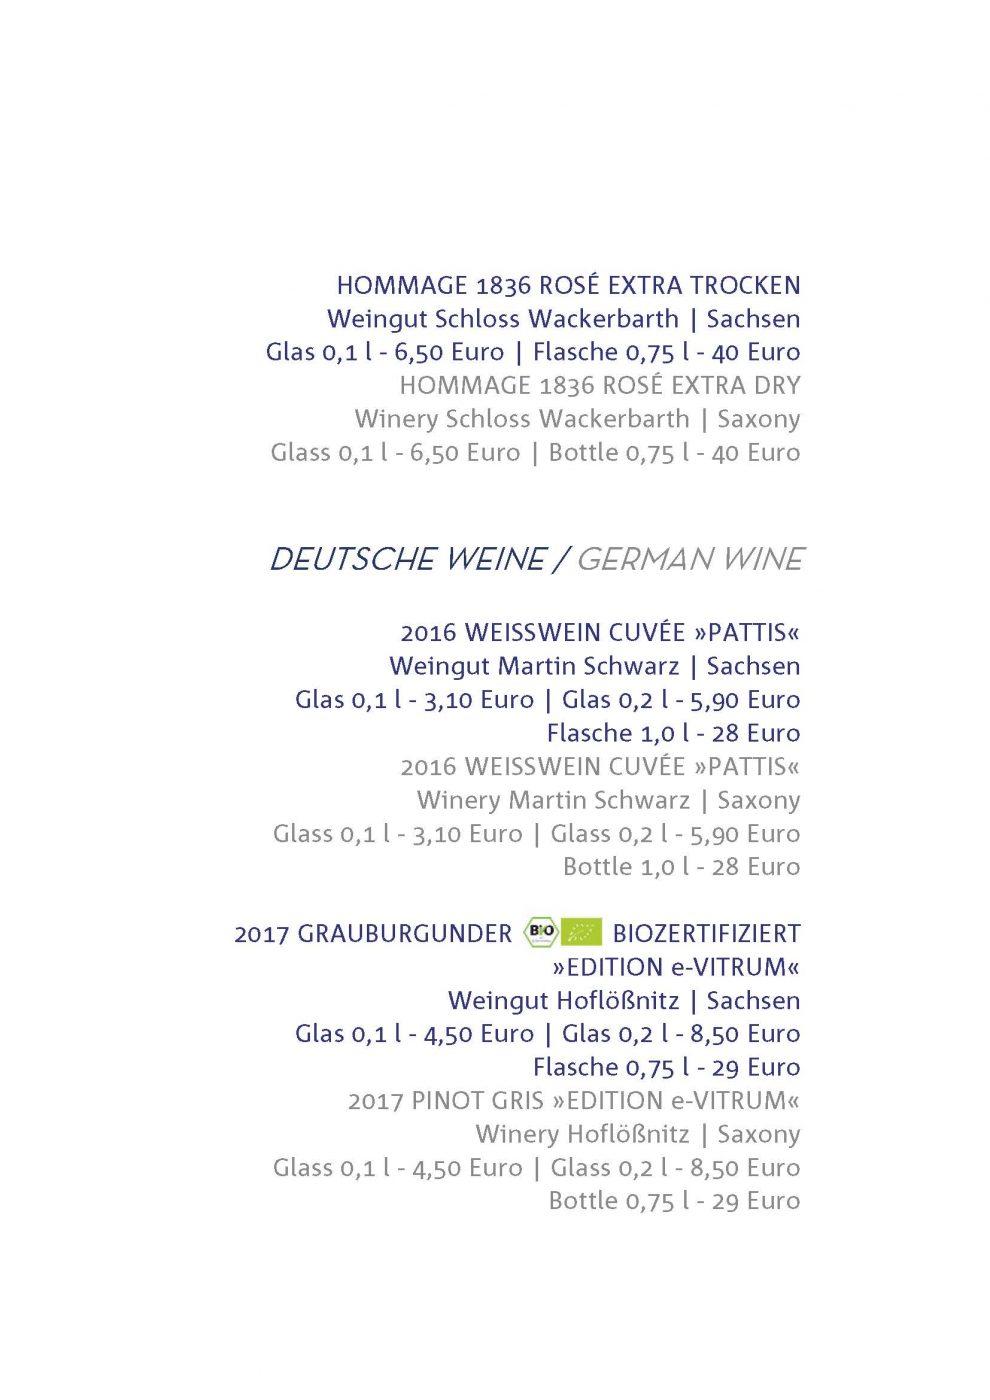 https://www.vitrum-dresden.de/wp-content/uploads/2018/08/3_AlkoholischeGetraenke_final_web_Seite_2-990x1400.jpg